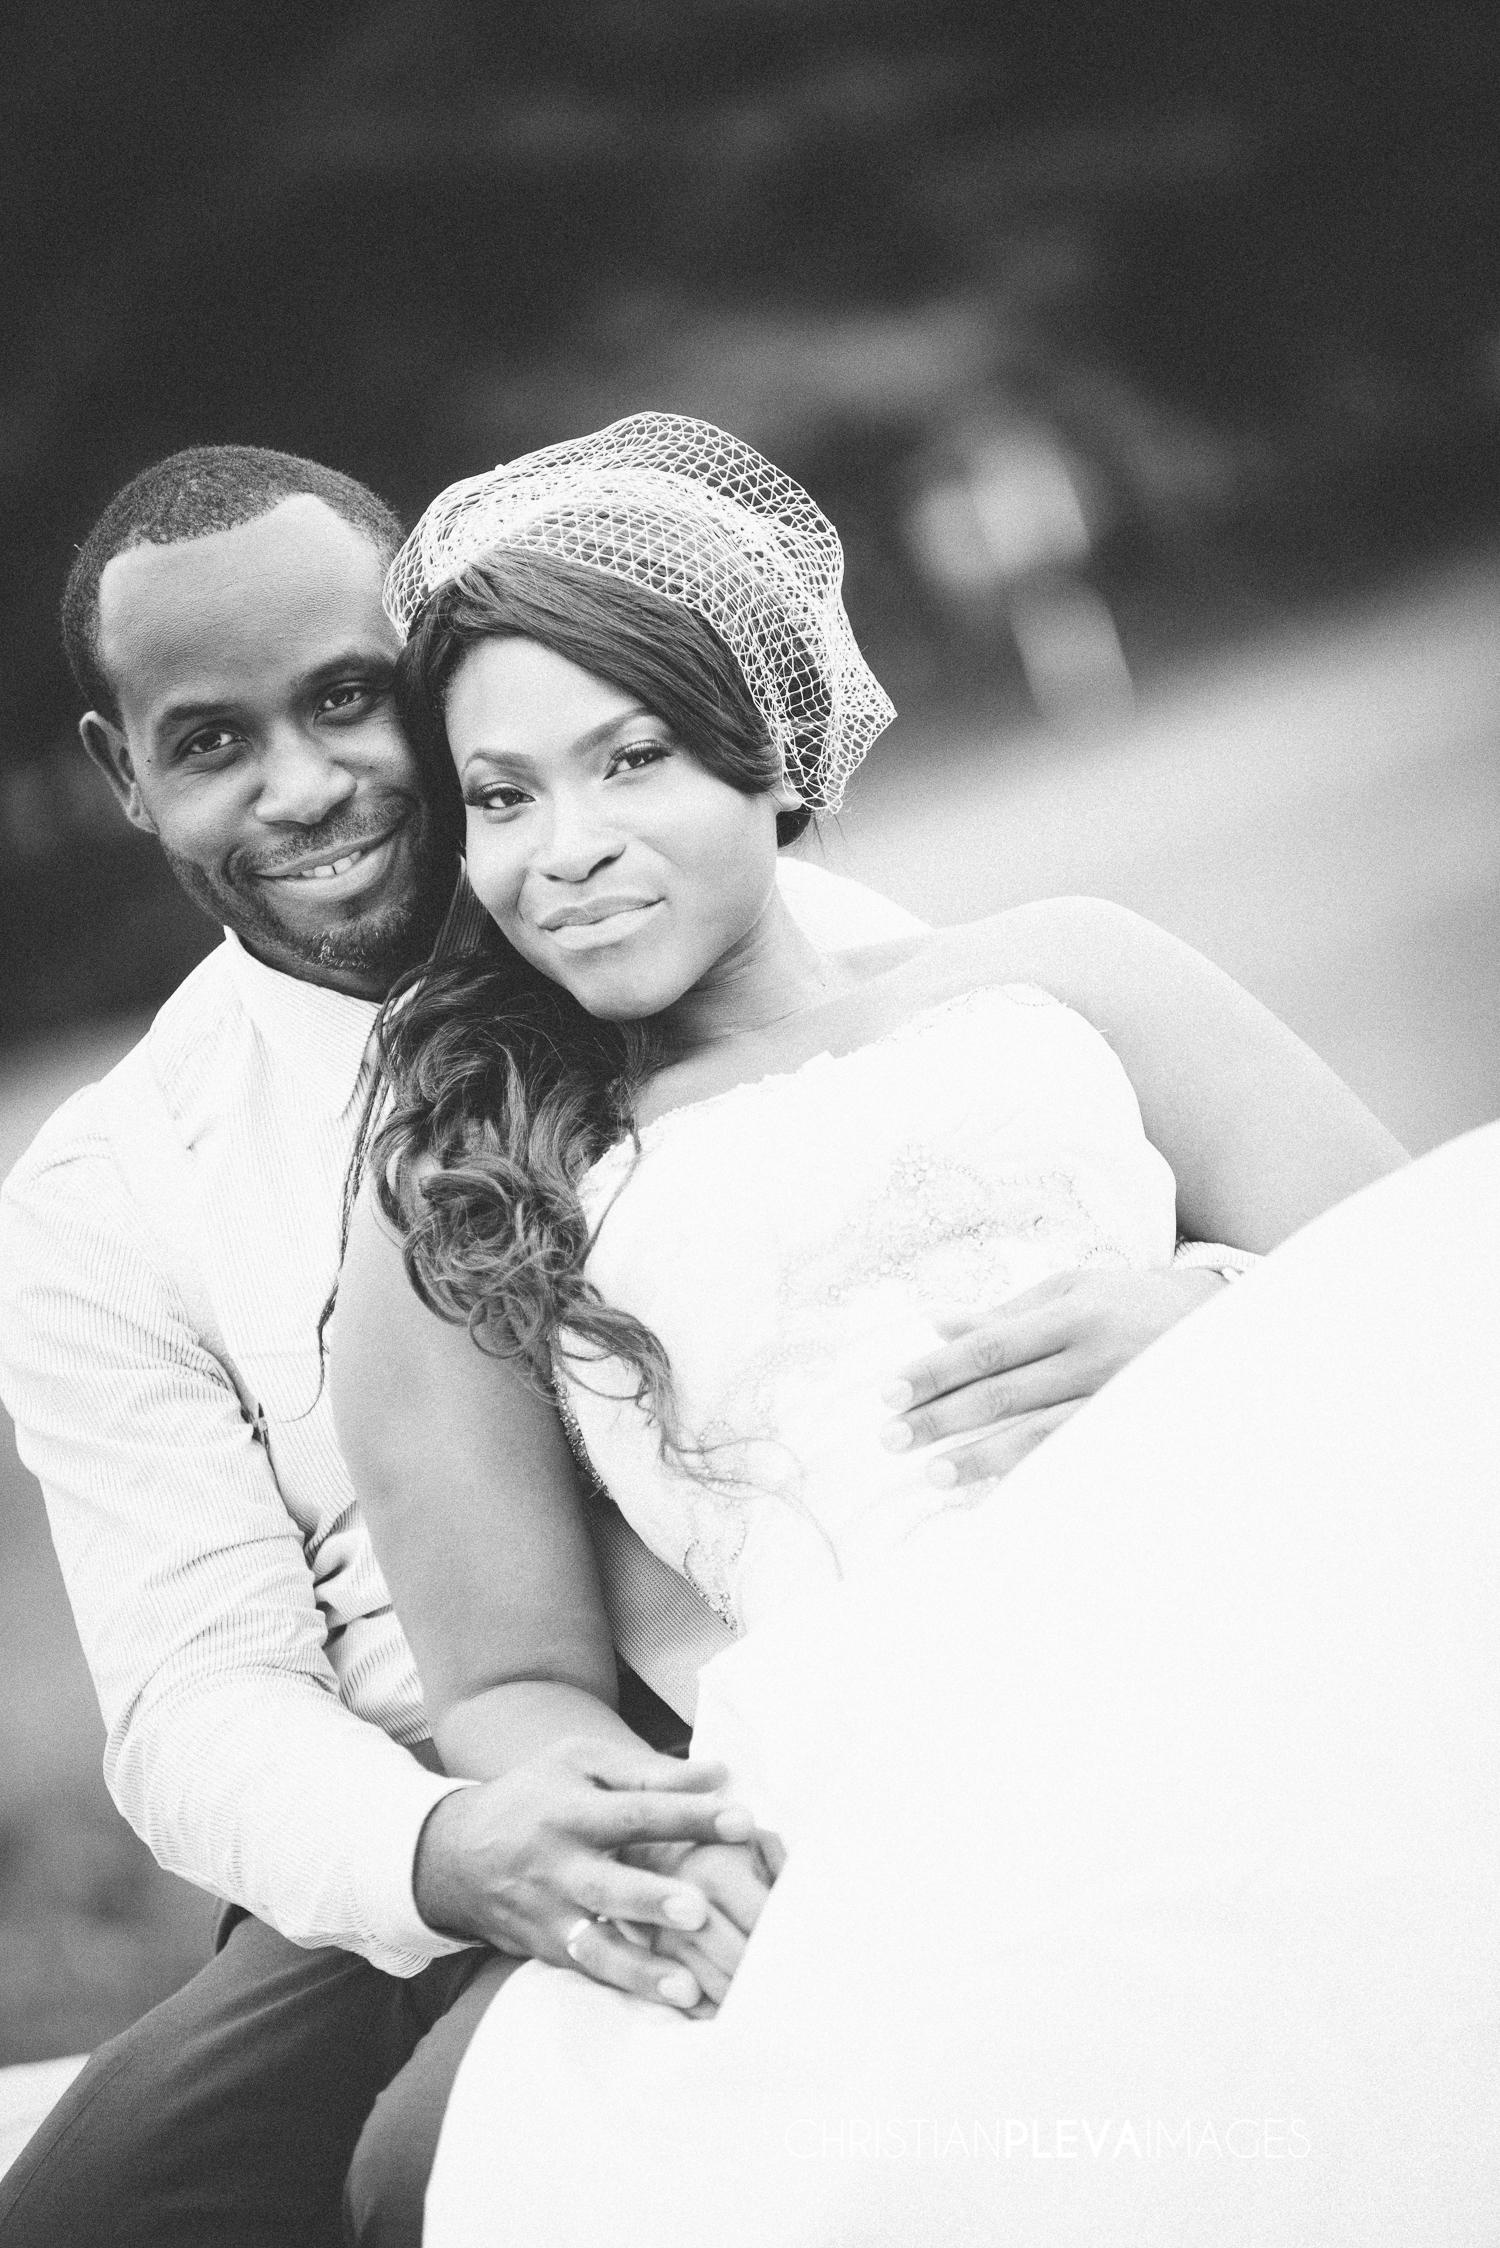 boston-wedding-photography-22.jpg